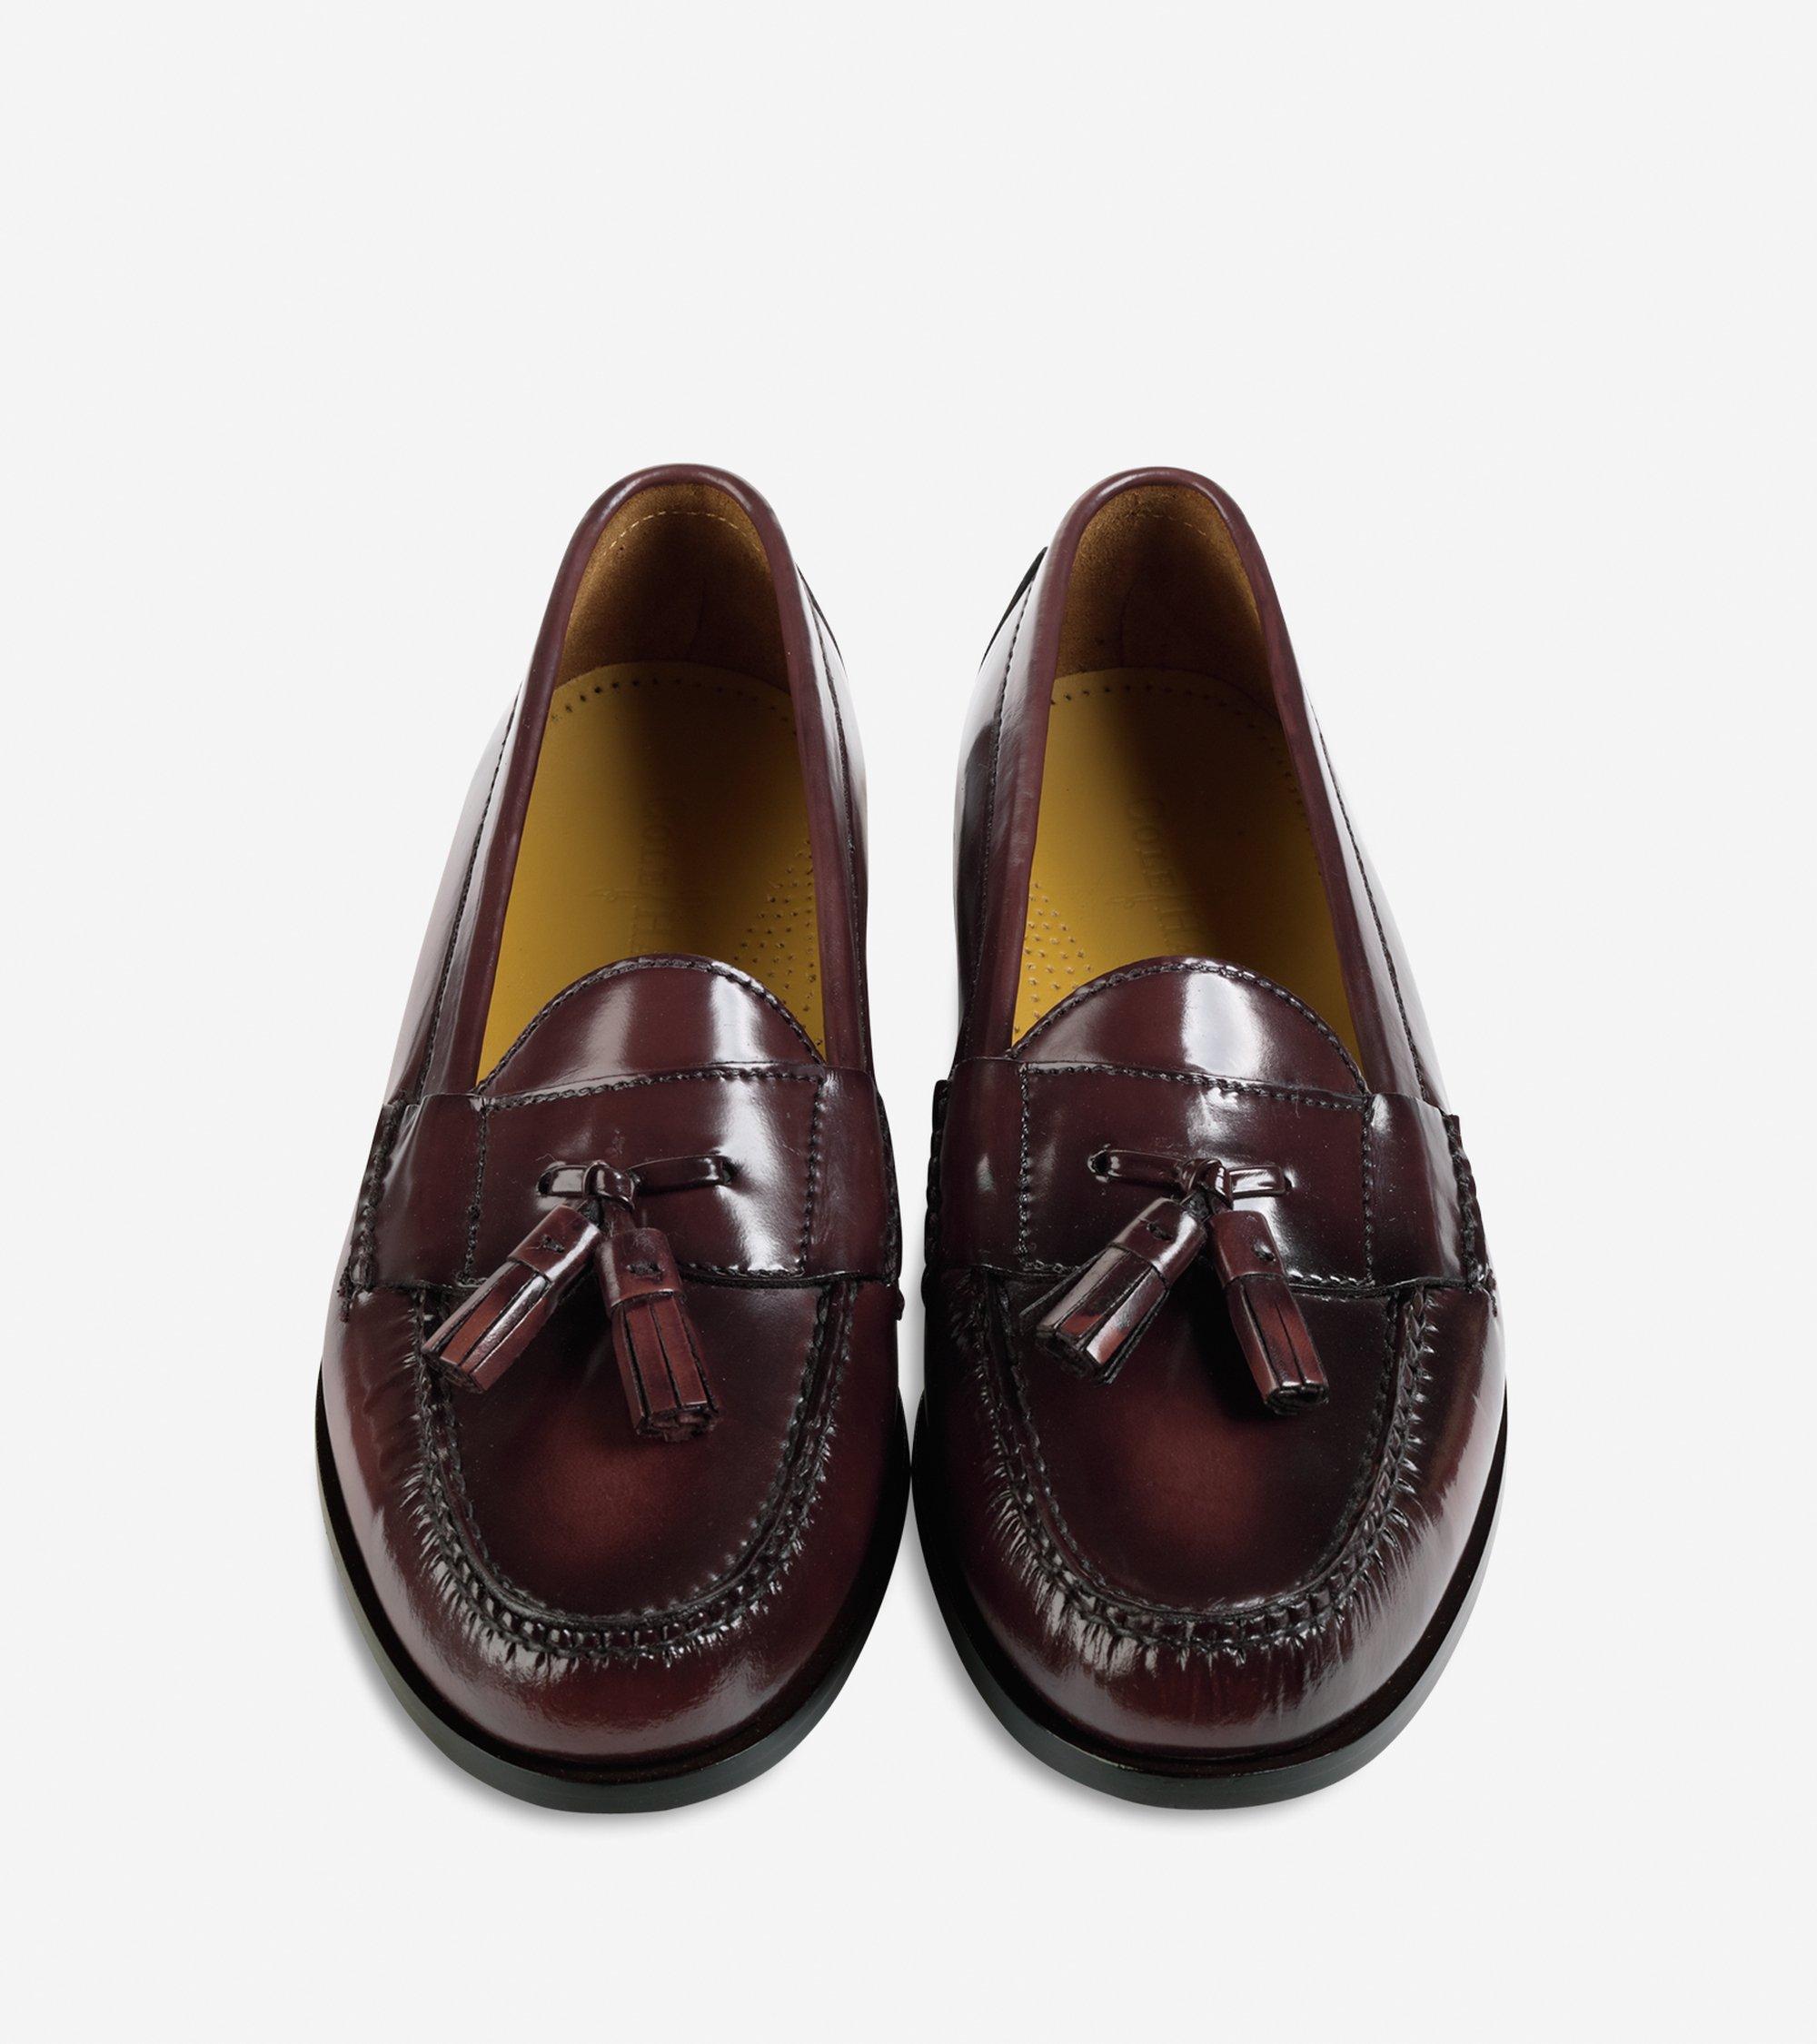 Cole Haan Pinch Tassel Loafer In Brown For Men Lyst